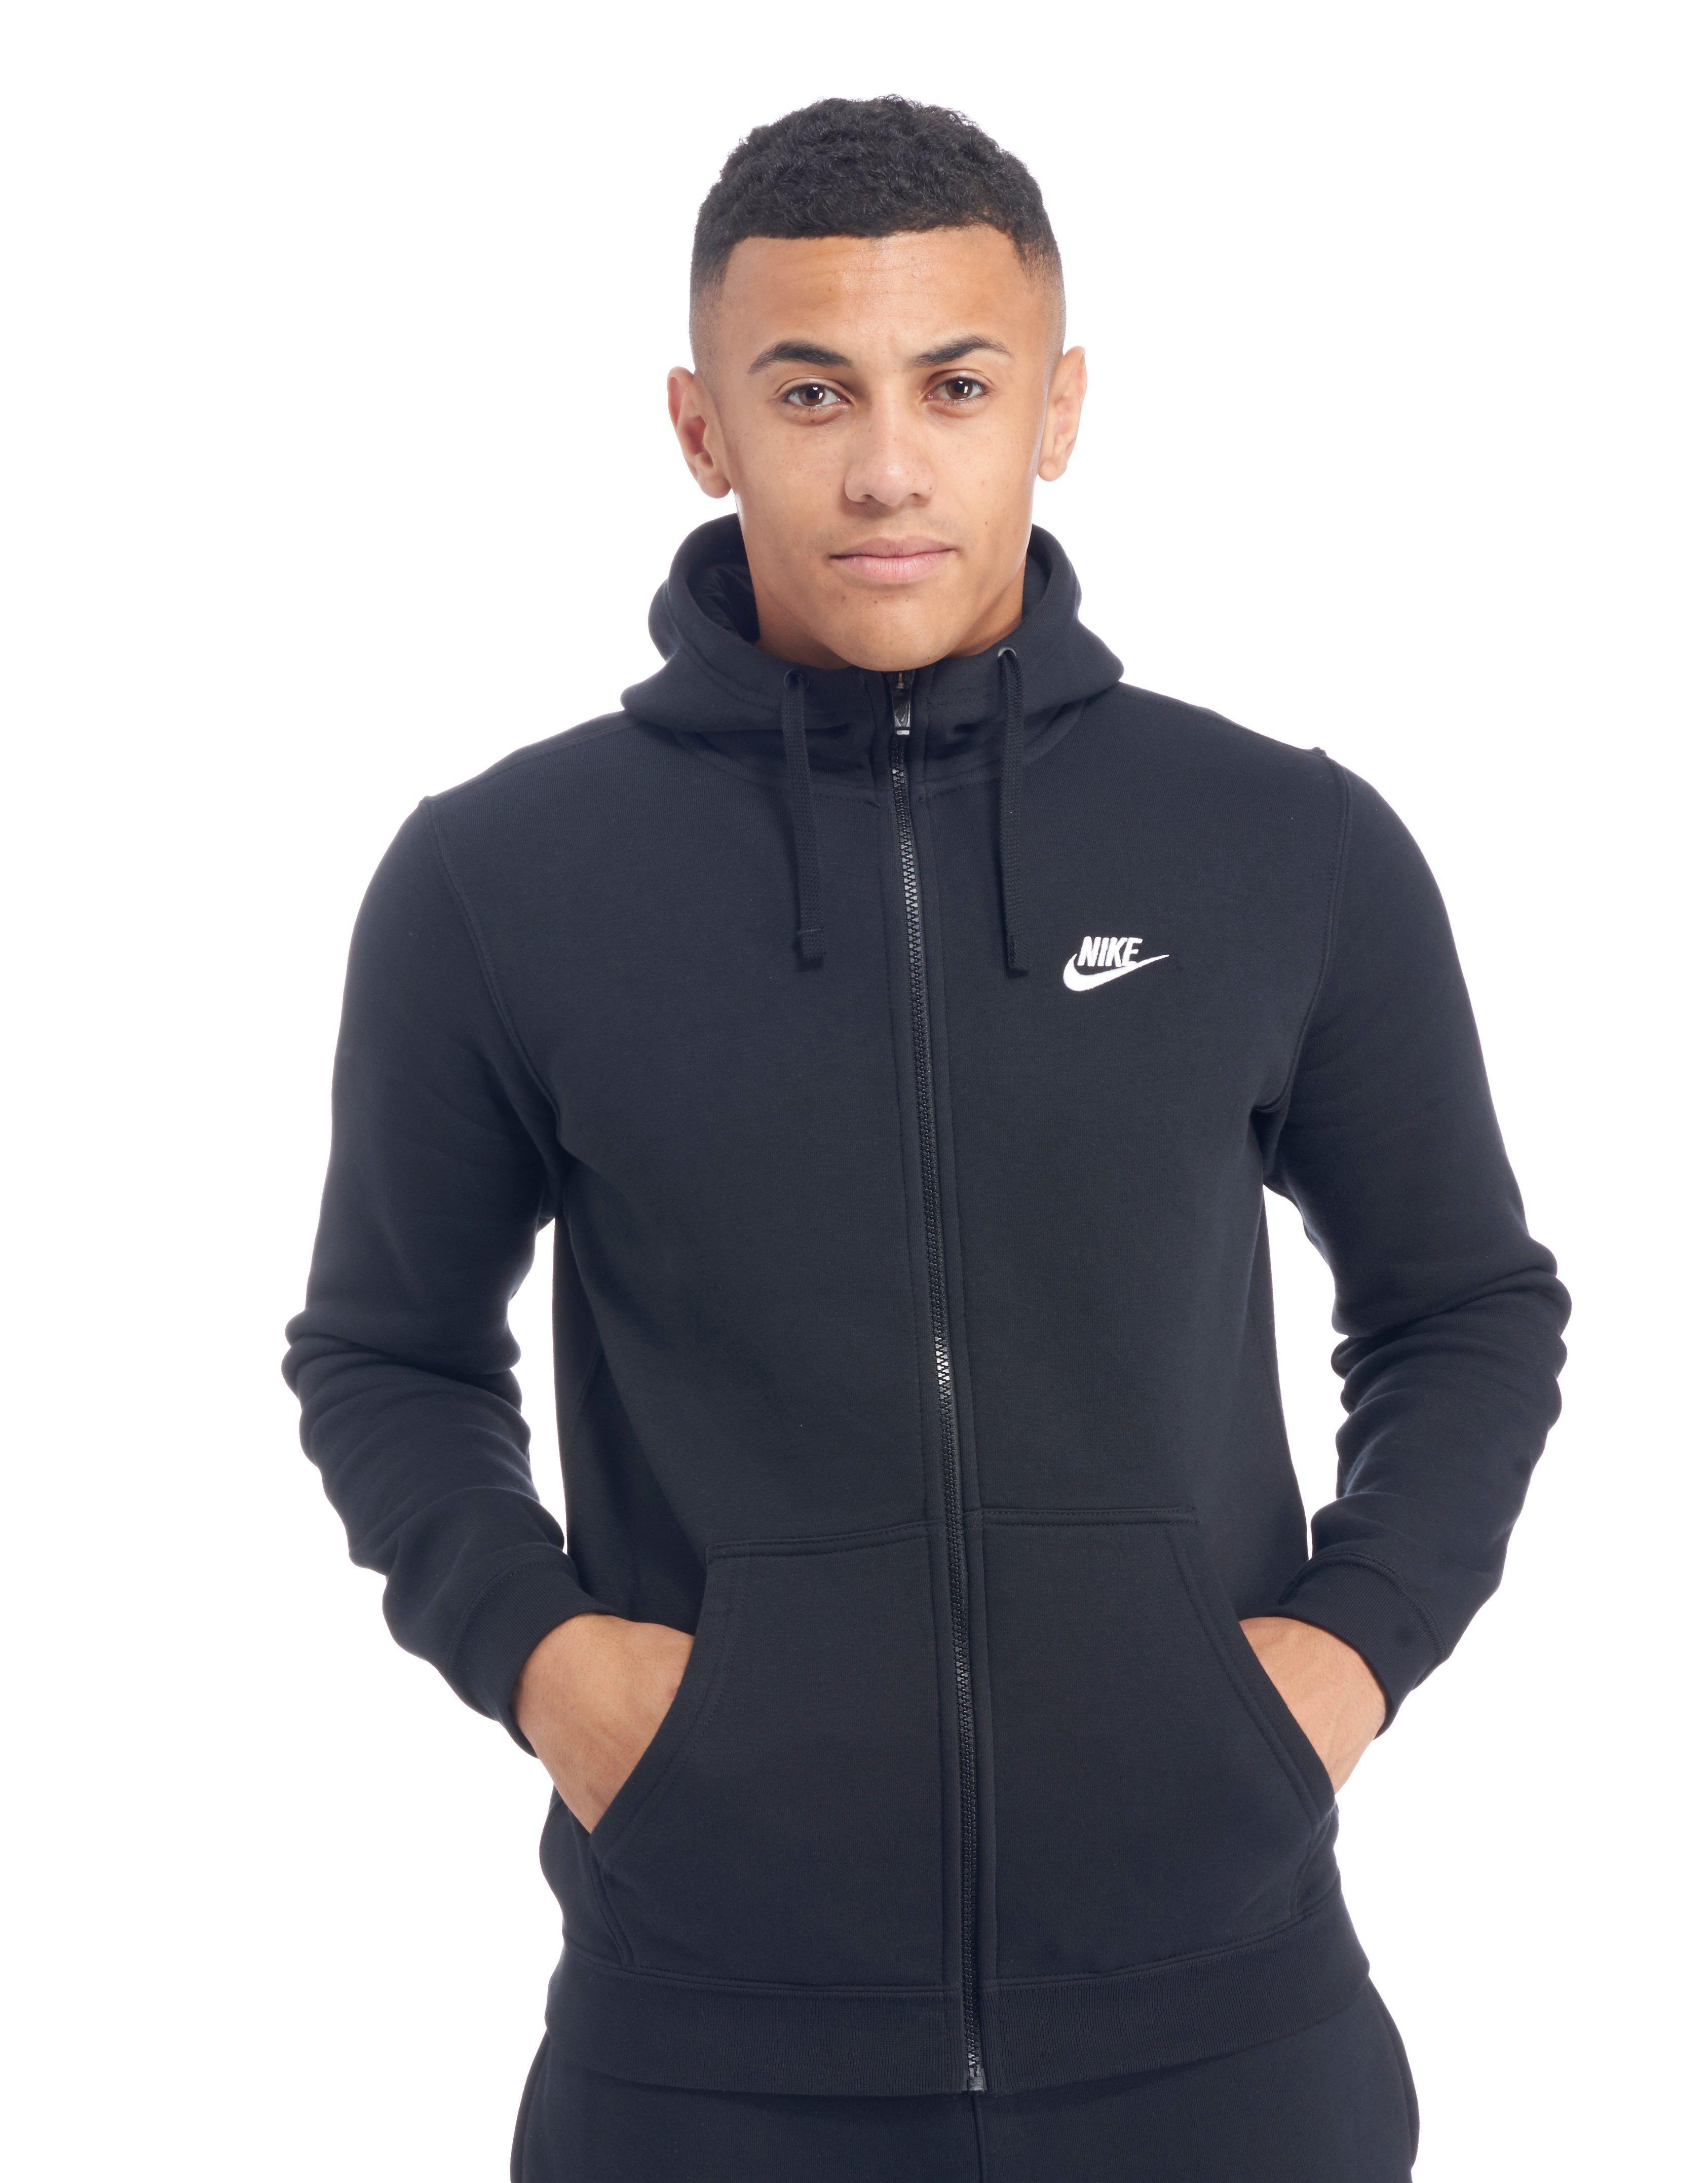 Nike. Men's Black Foundation Fleece Full Zip Hoody